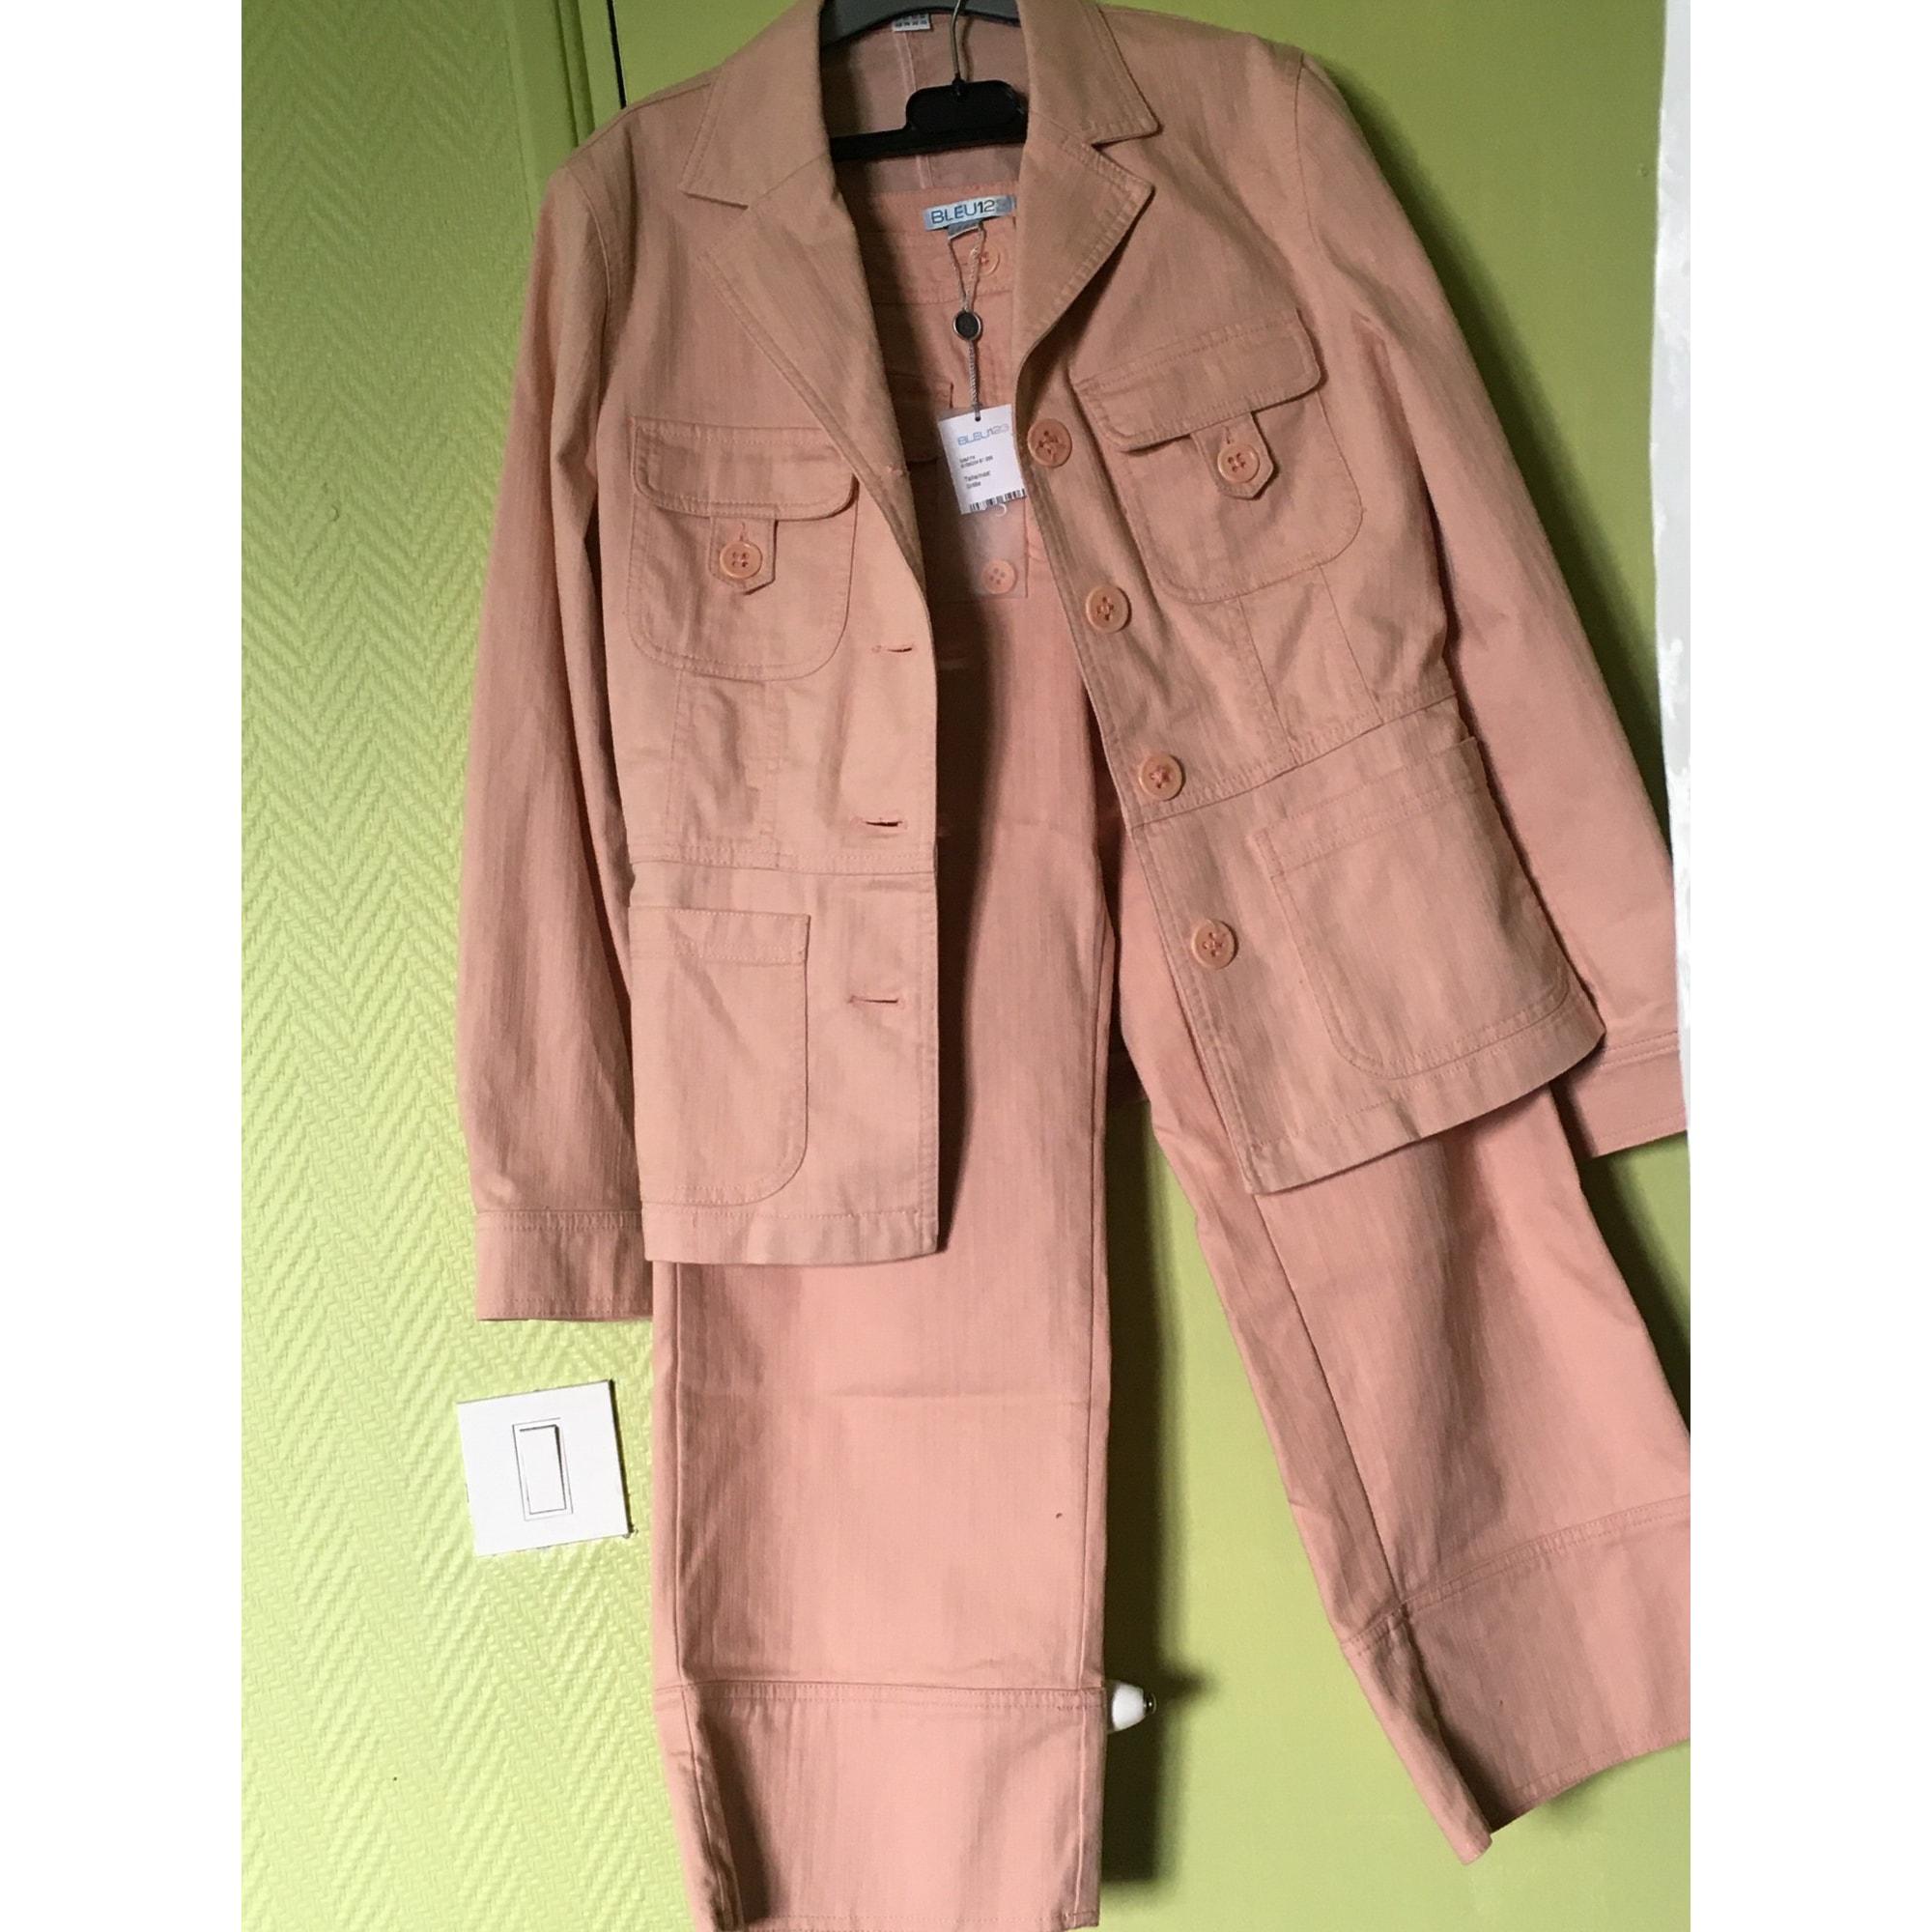 Tailleur pantalon BLEU 123 Rose, fuschia, vieux rose